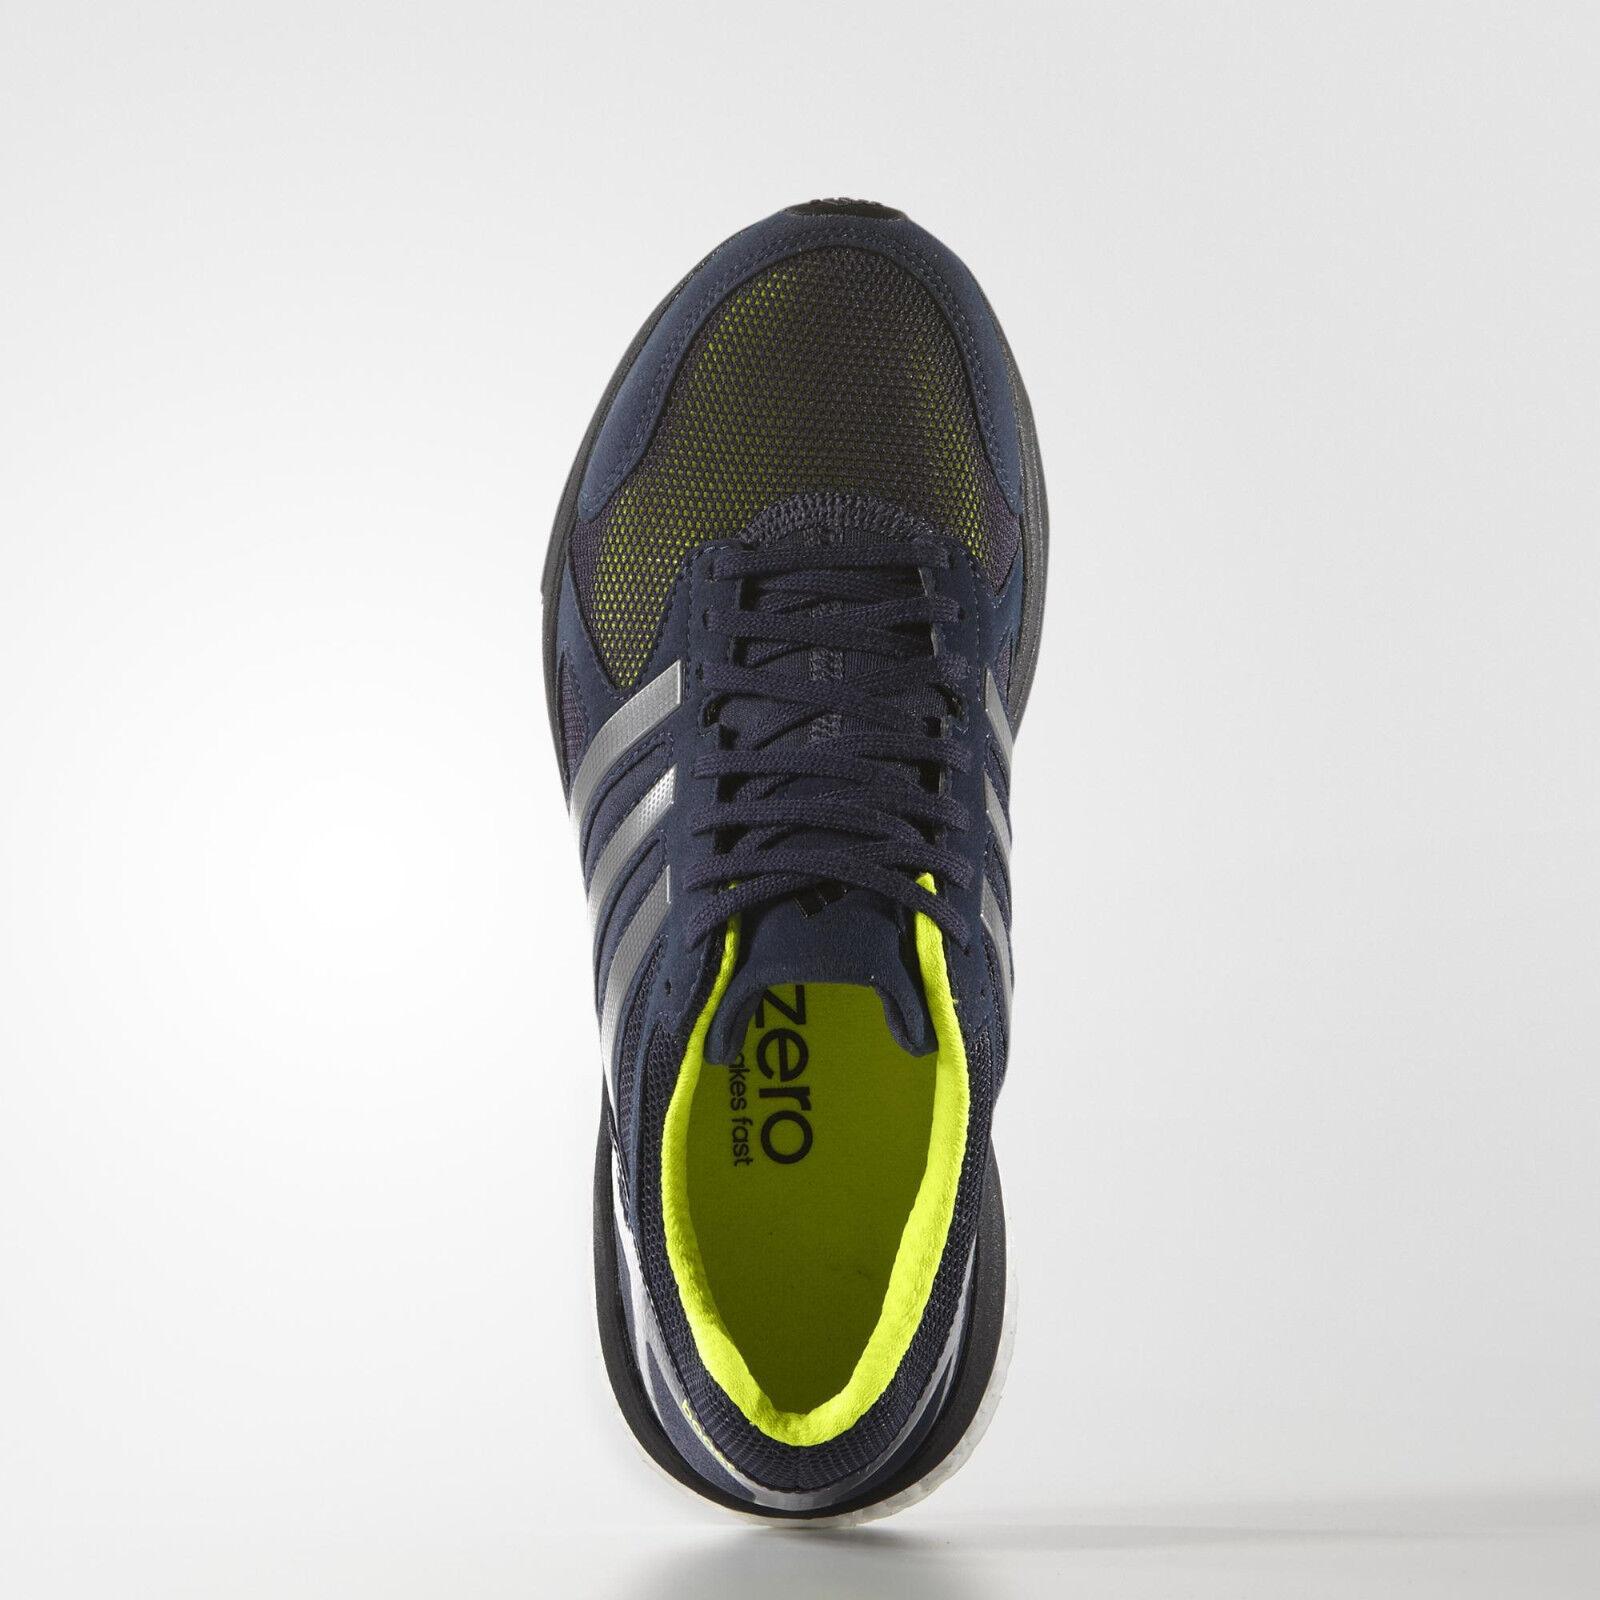 Adidas ADIZERO TEMPO BOOST Running TORSION Energy shoes supernova gymWomen sz 10